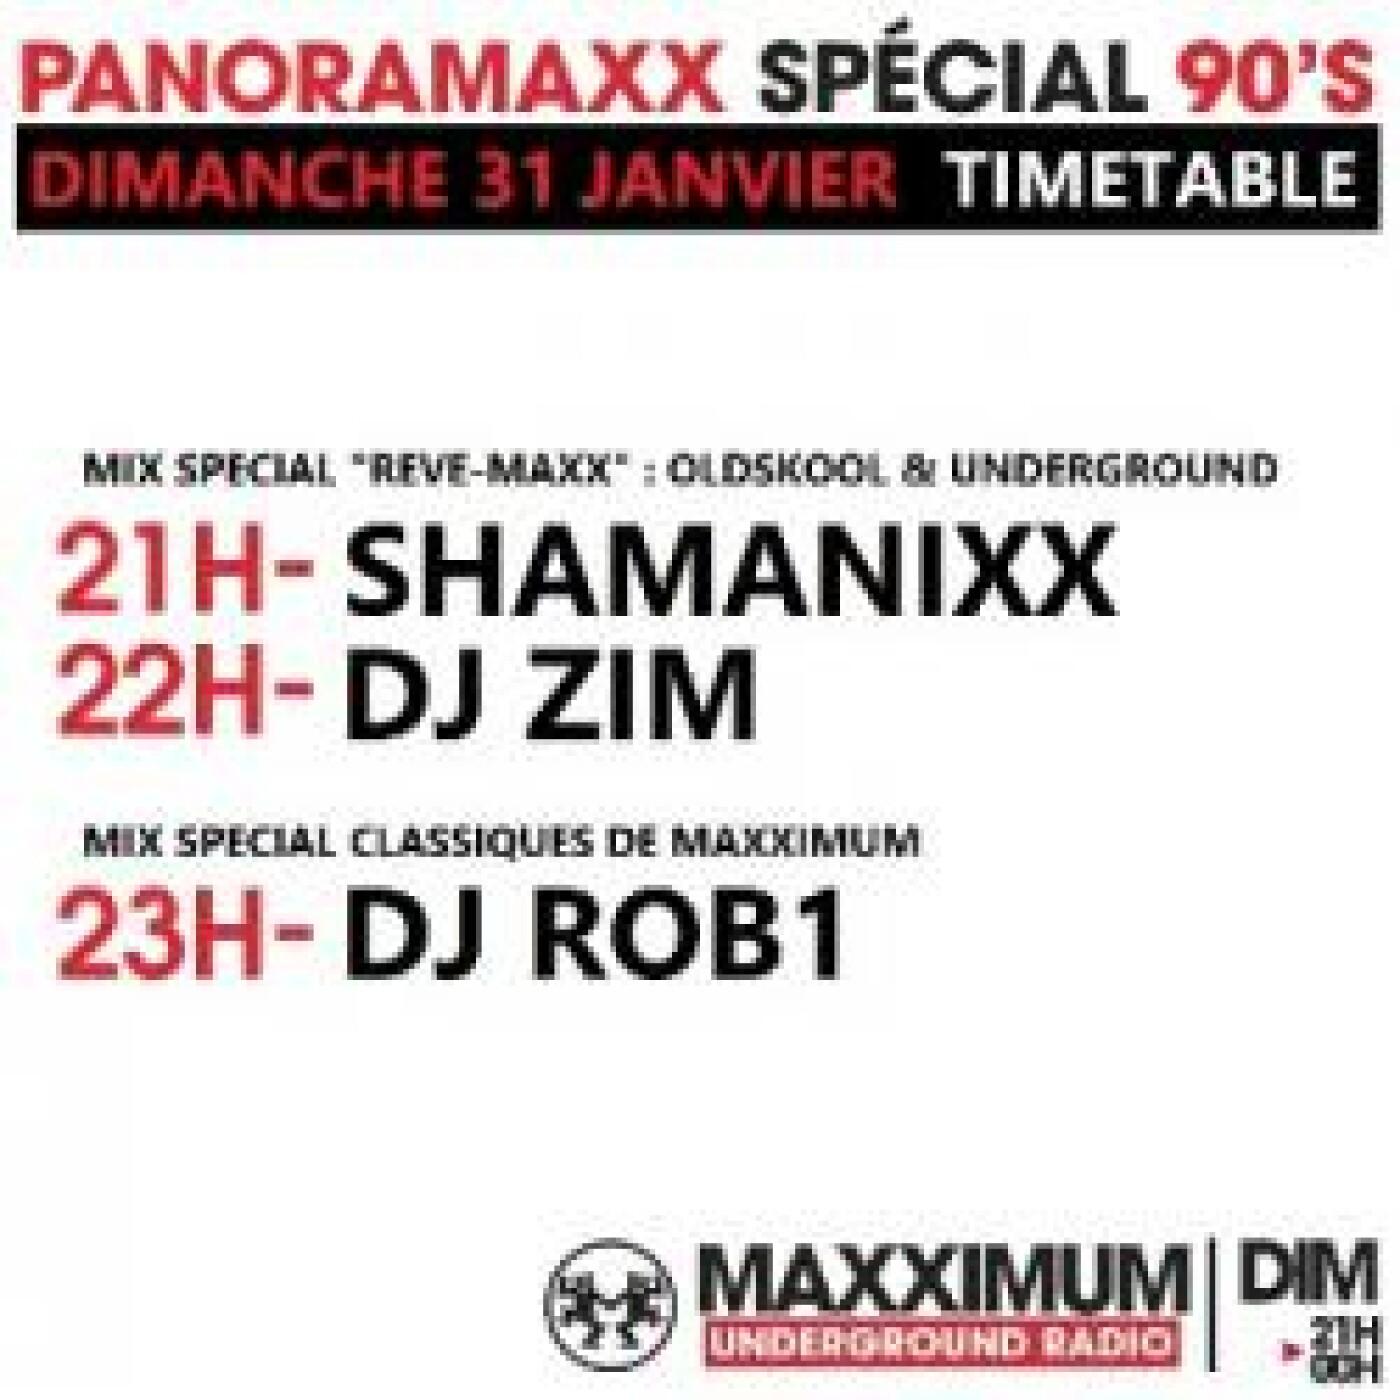 PANORAMAXX 90'S : DJ ROB1